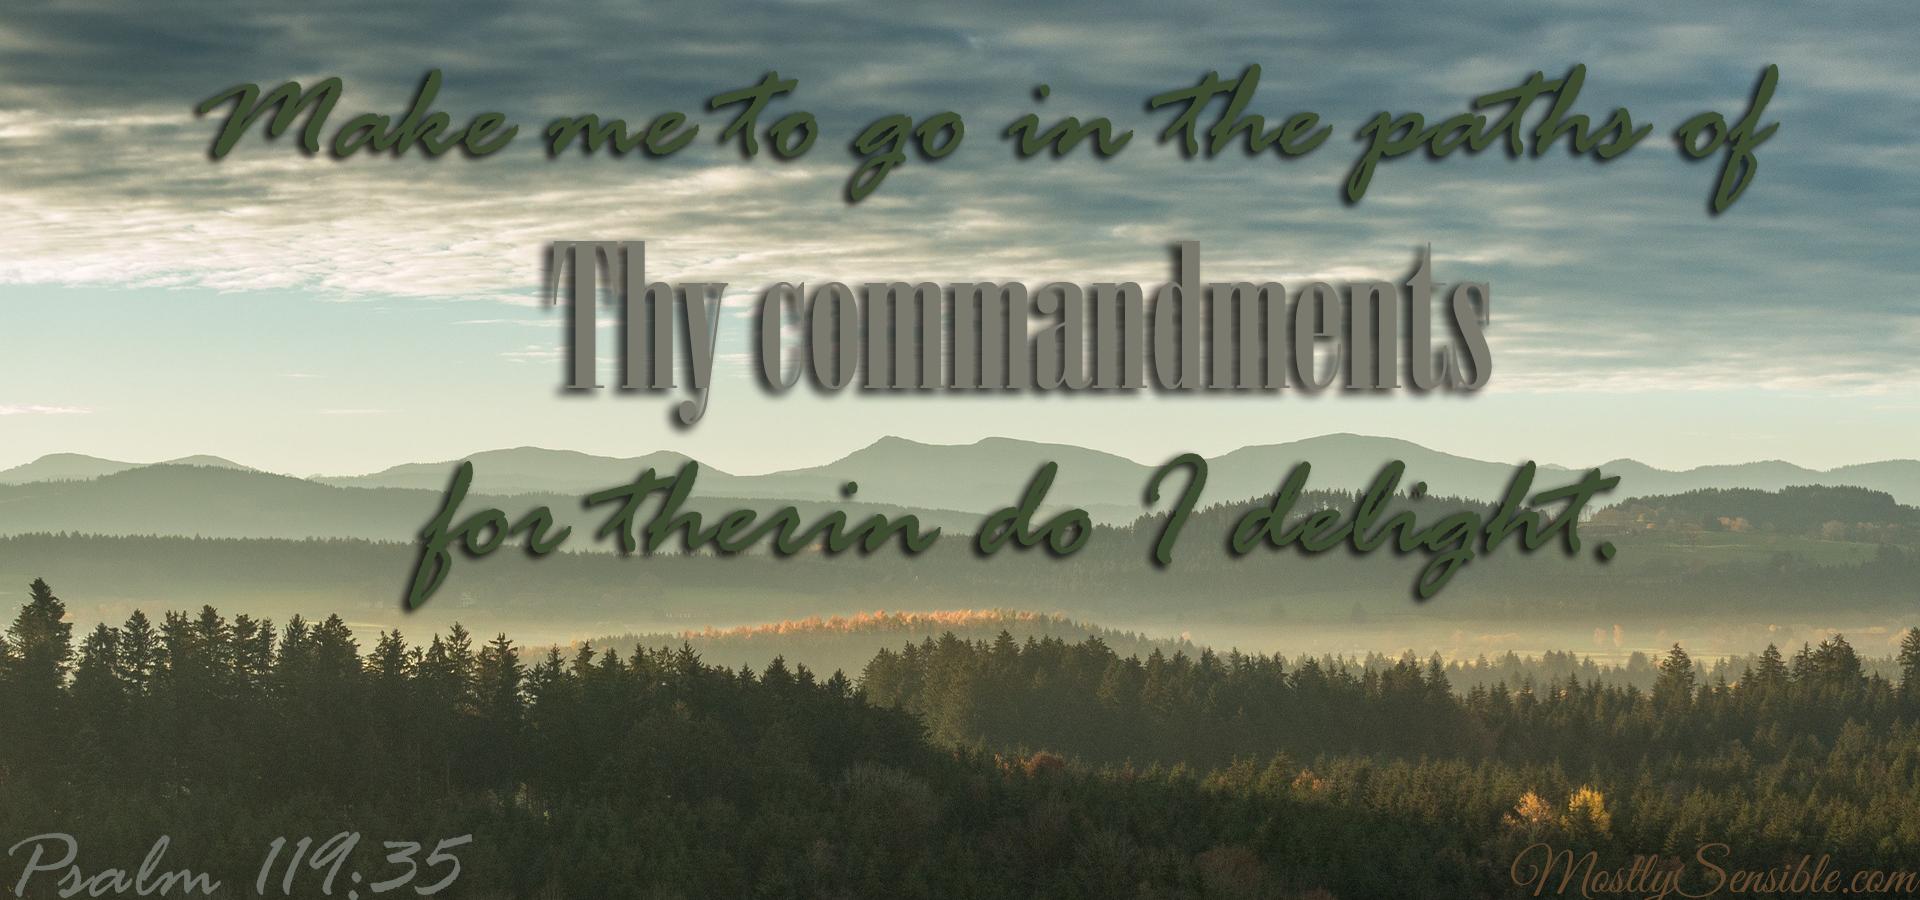 Psalm 119.35